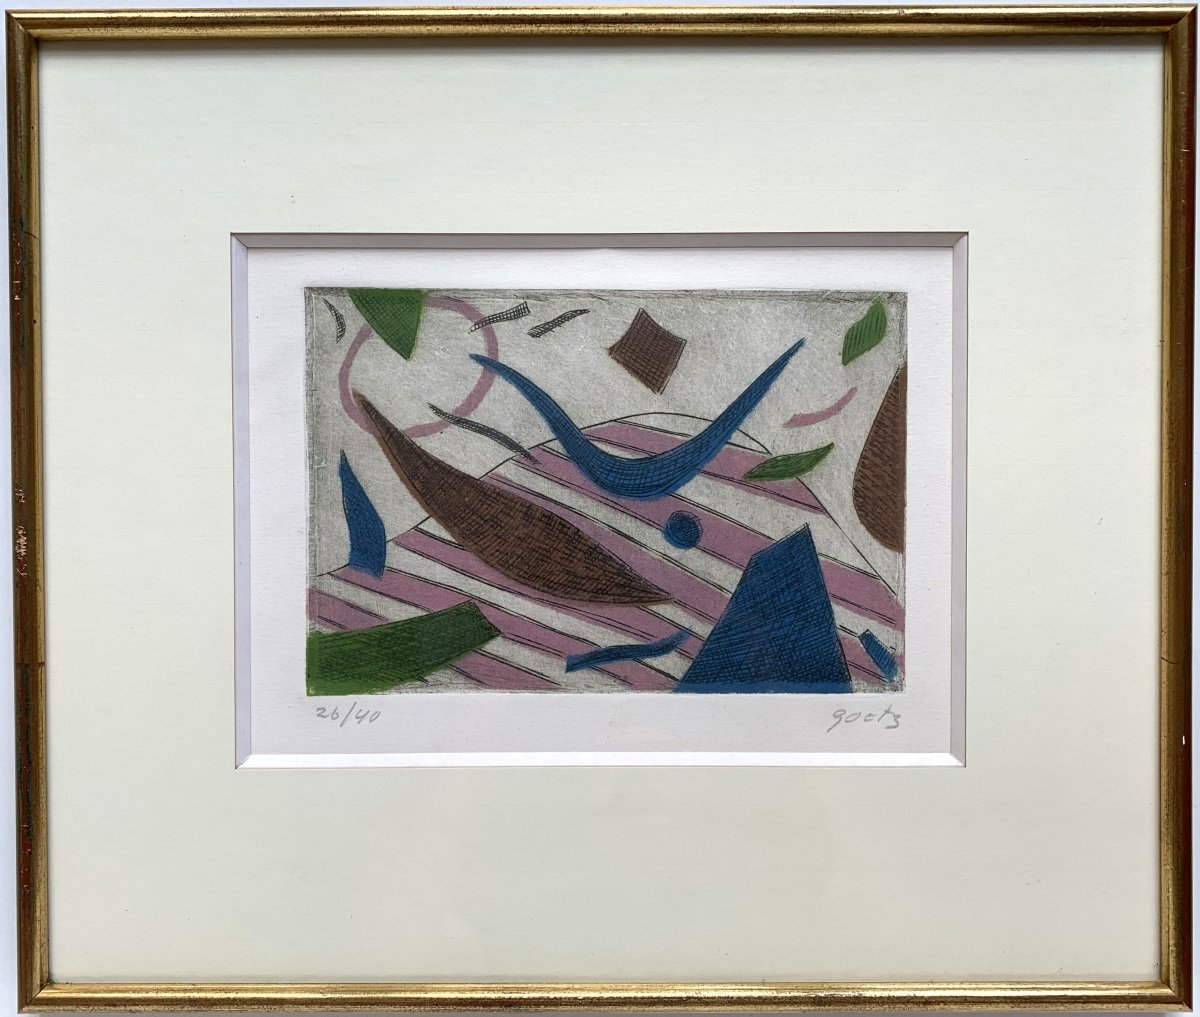 Henri Goetz (1909-1989) - Abstract Composition - Aquatint-photo-2